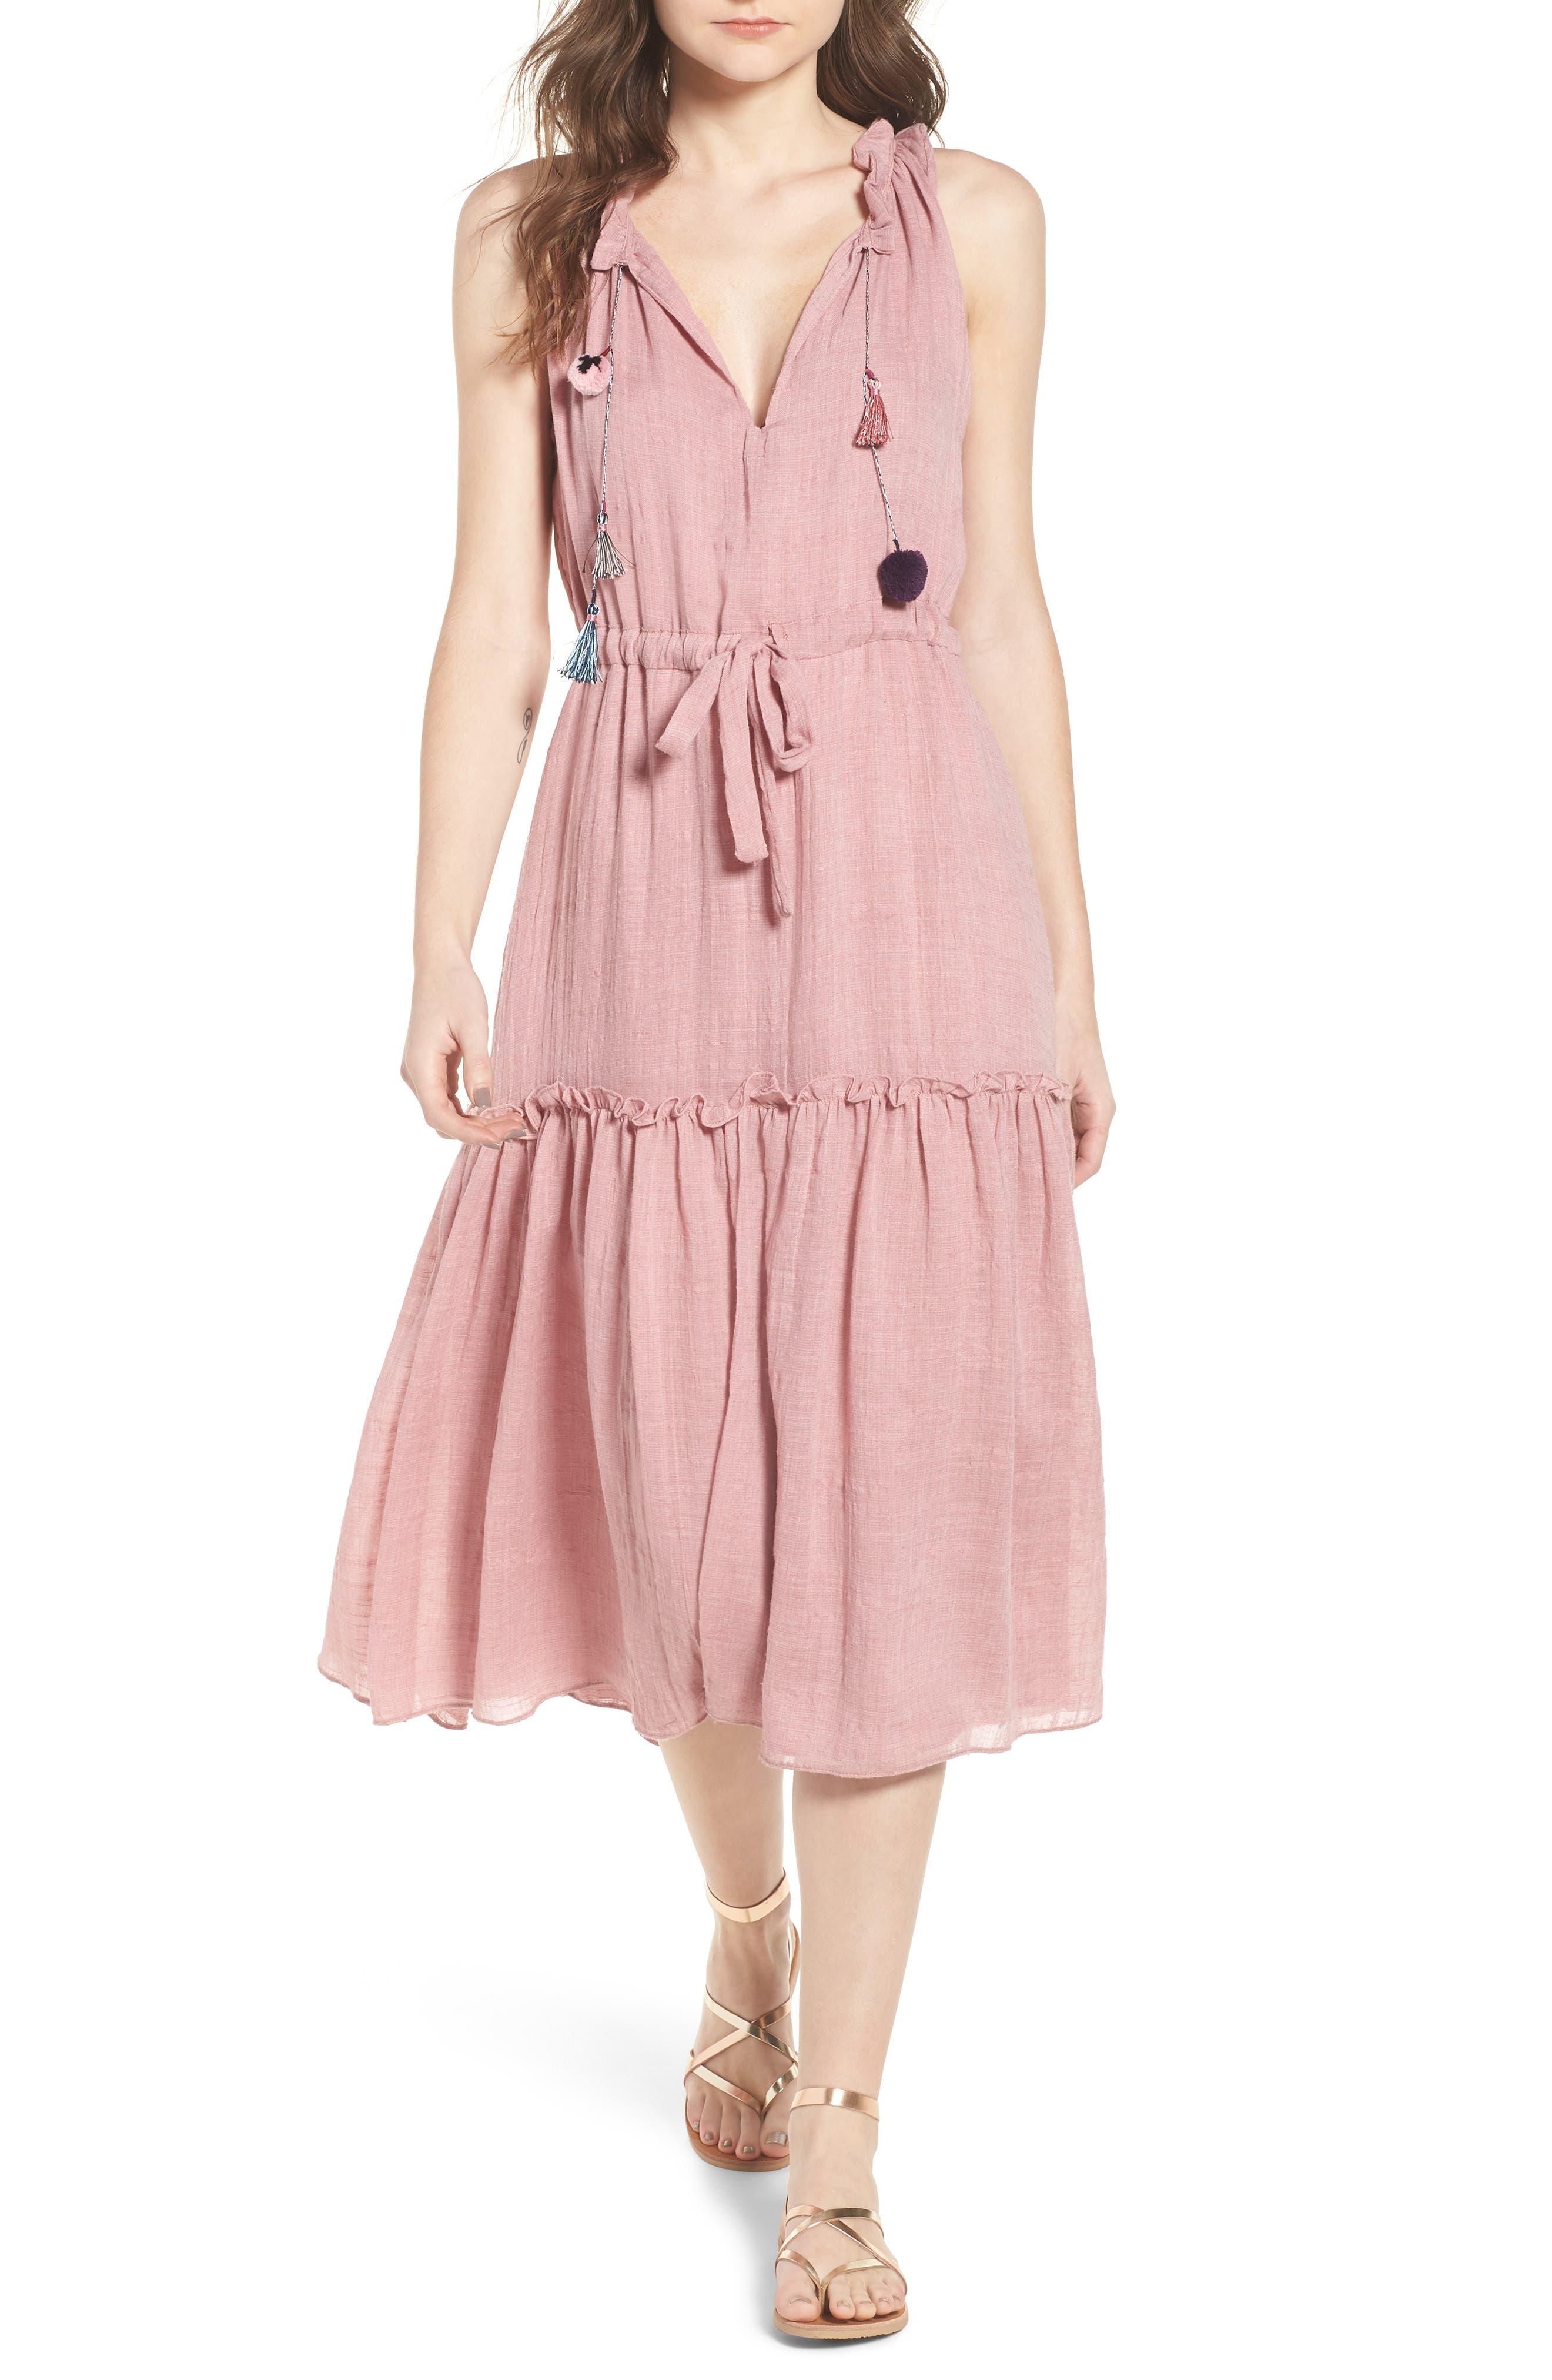 Nicolleta Tie Waist Midi Dress,                         Main,                         color, Dusty Pink